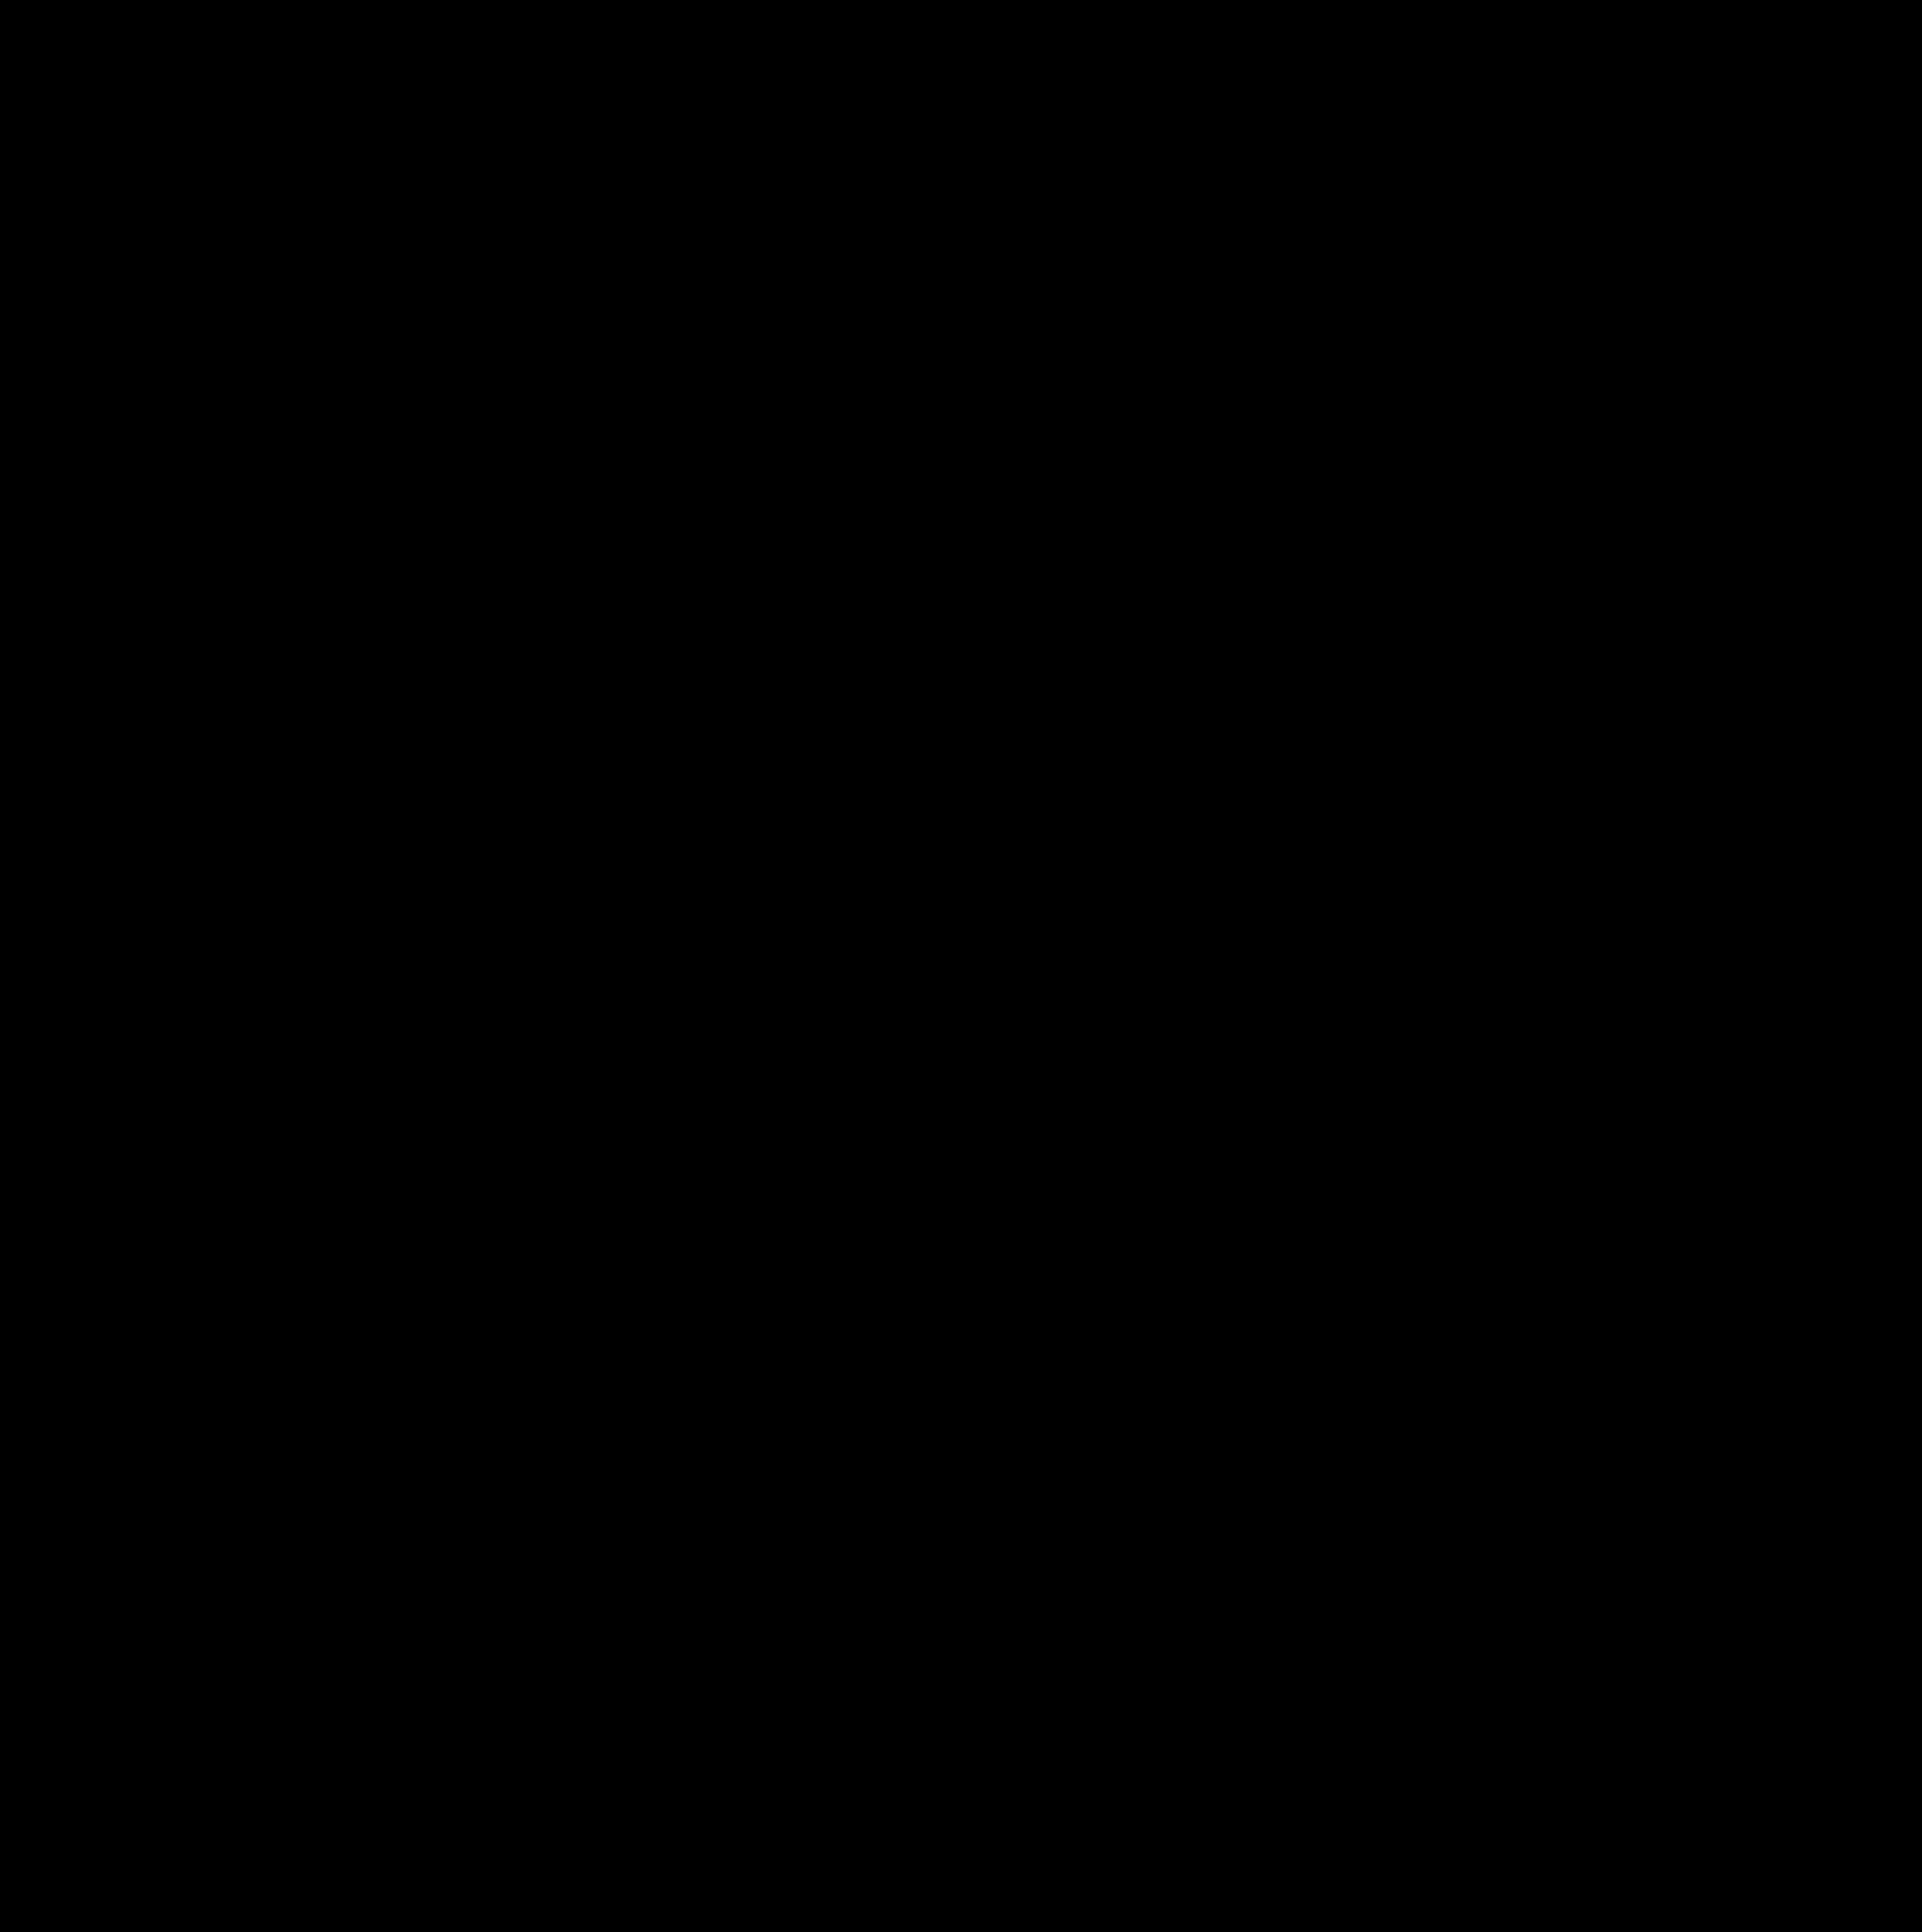 clip art library Transparent symbol. Spiral black clip art.